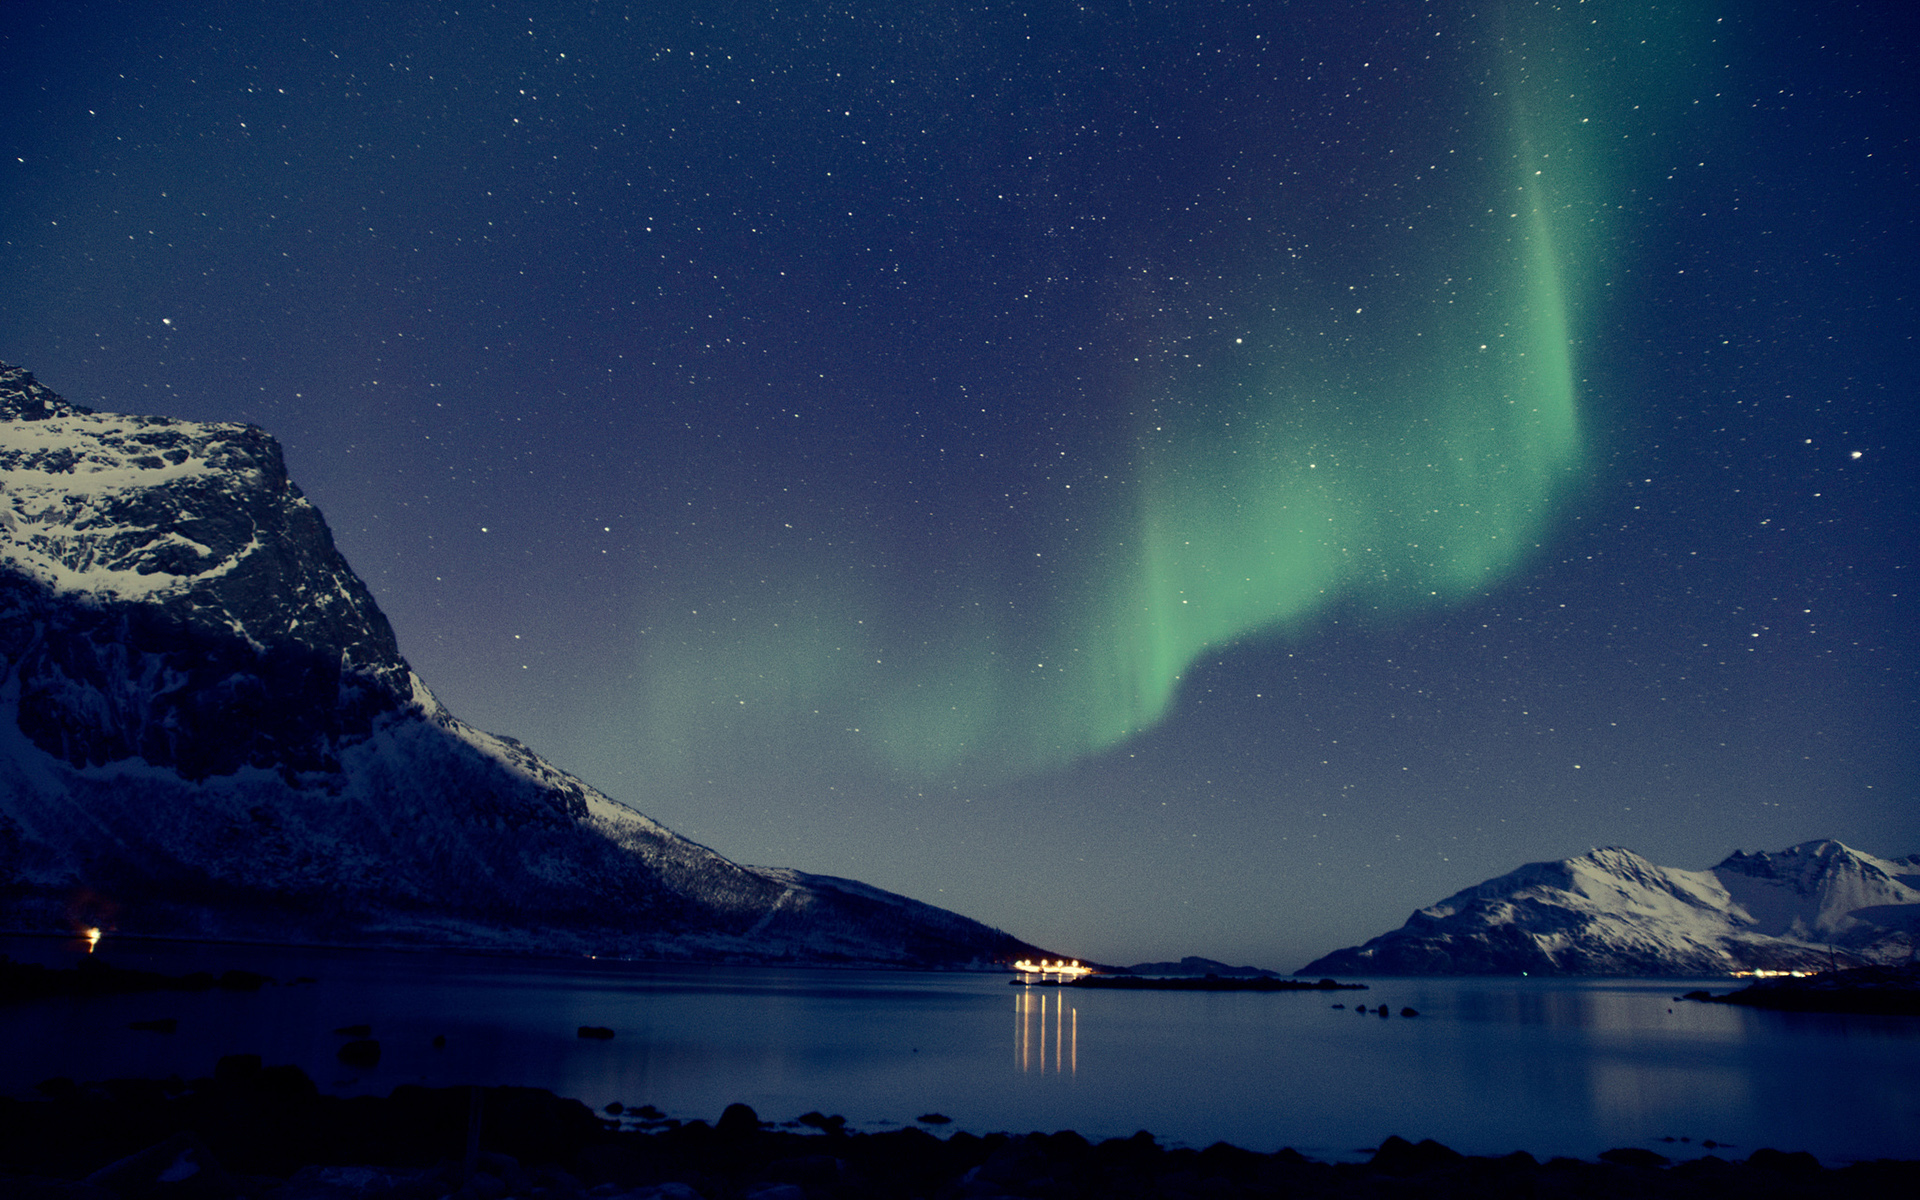 Aurora borealis hd wallpaper sfondi 1920x1200 id for Sfondi desktop aurora boreale